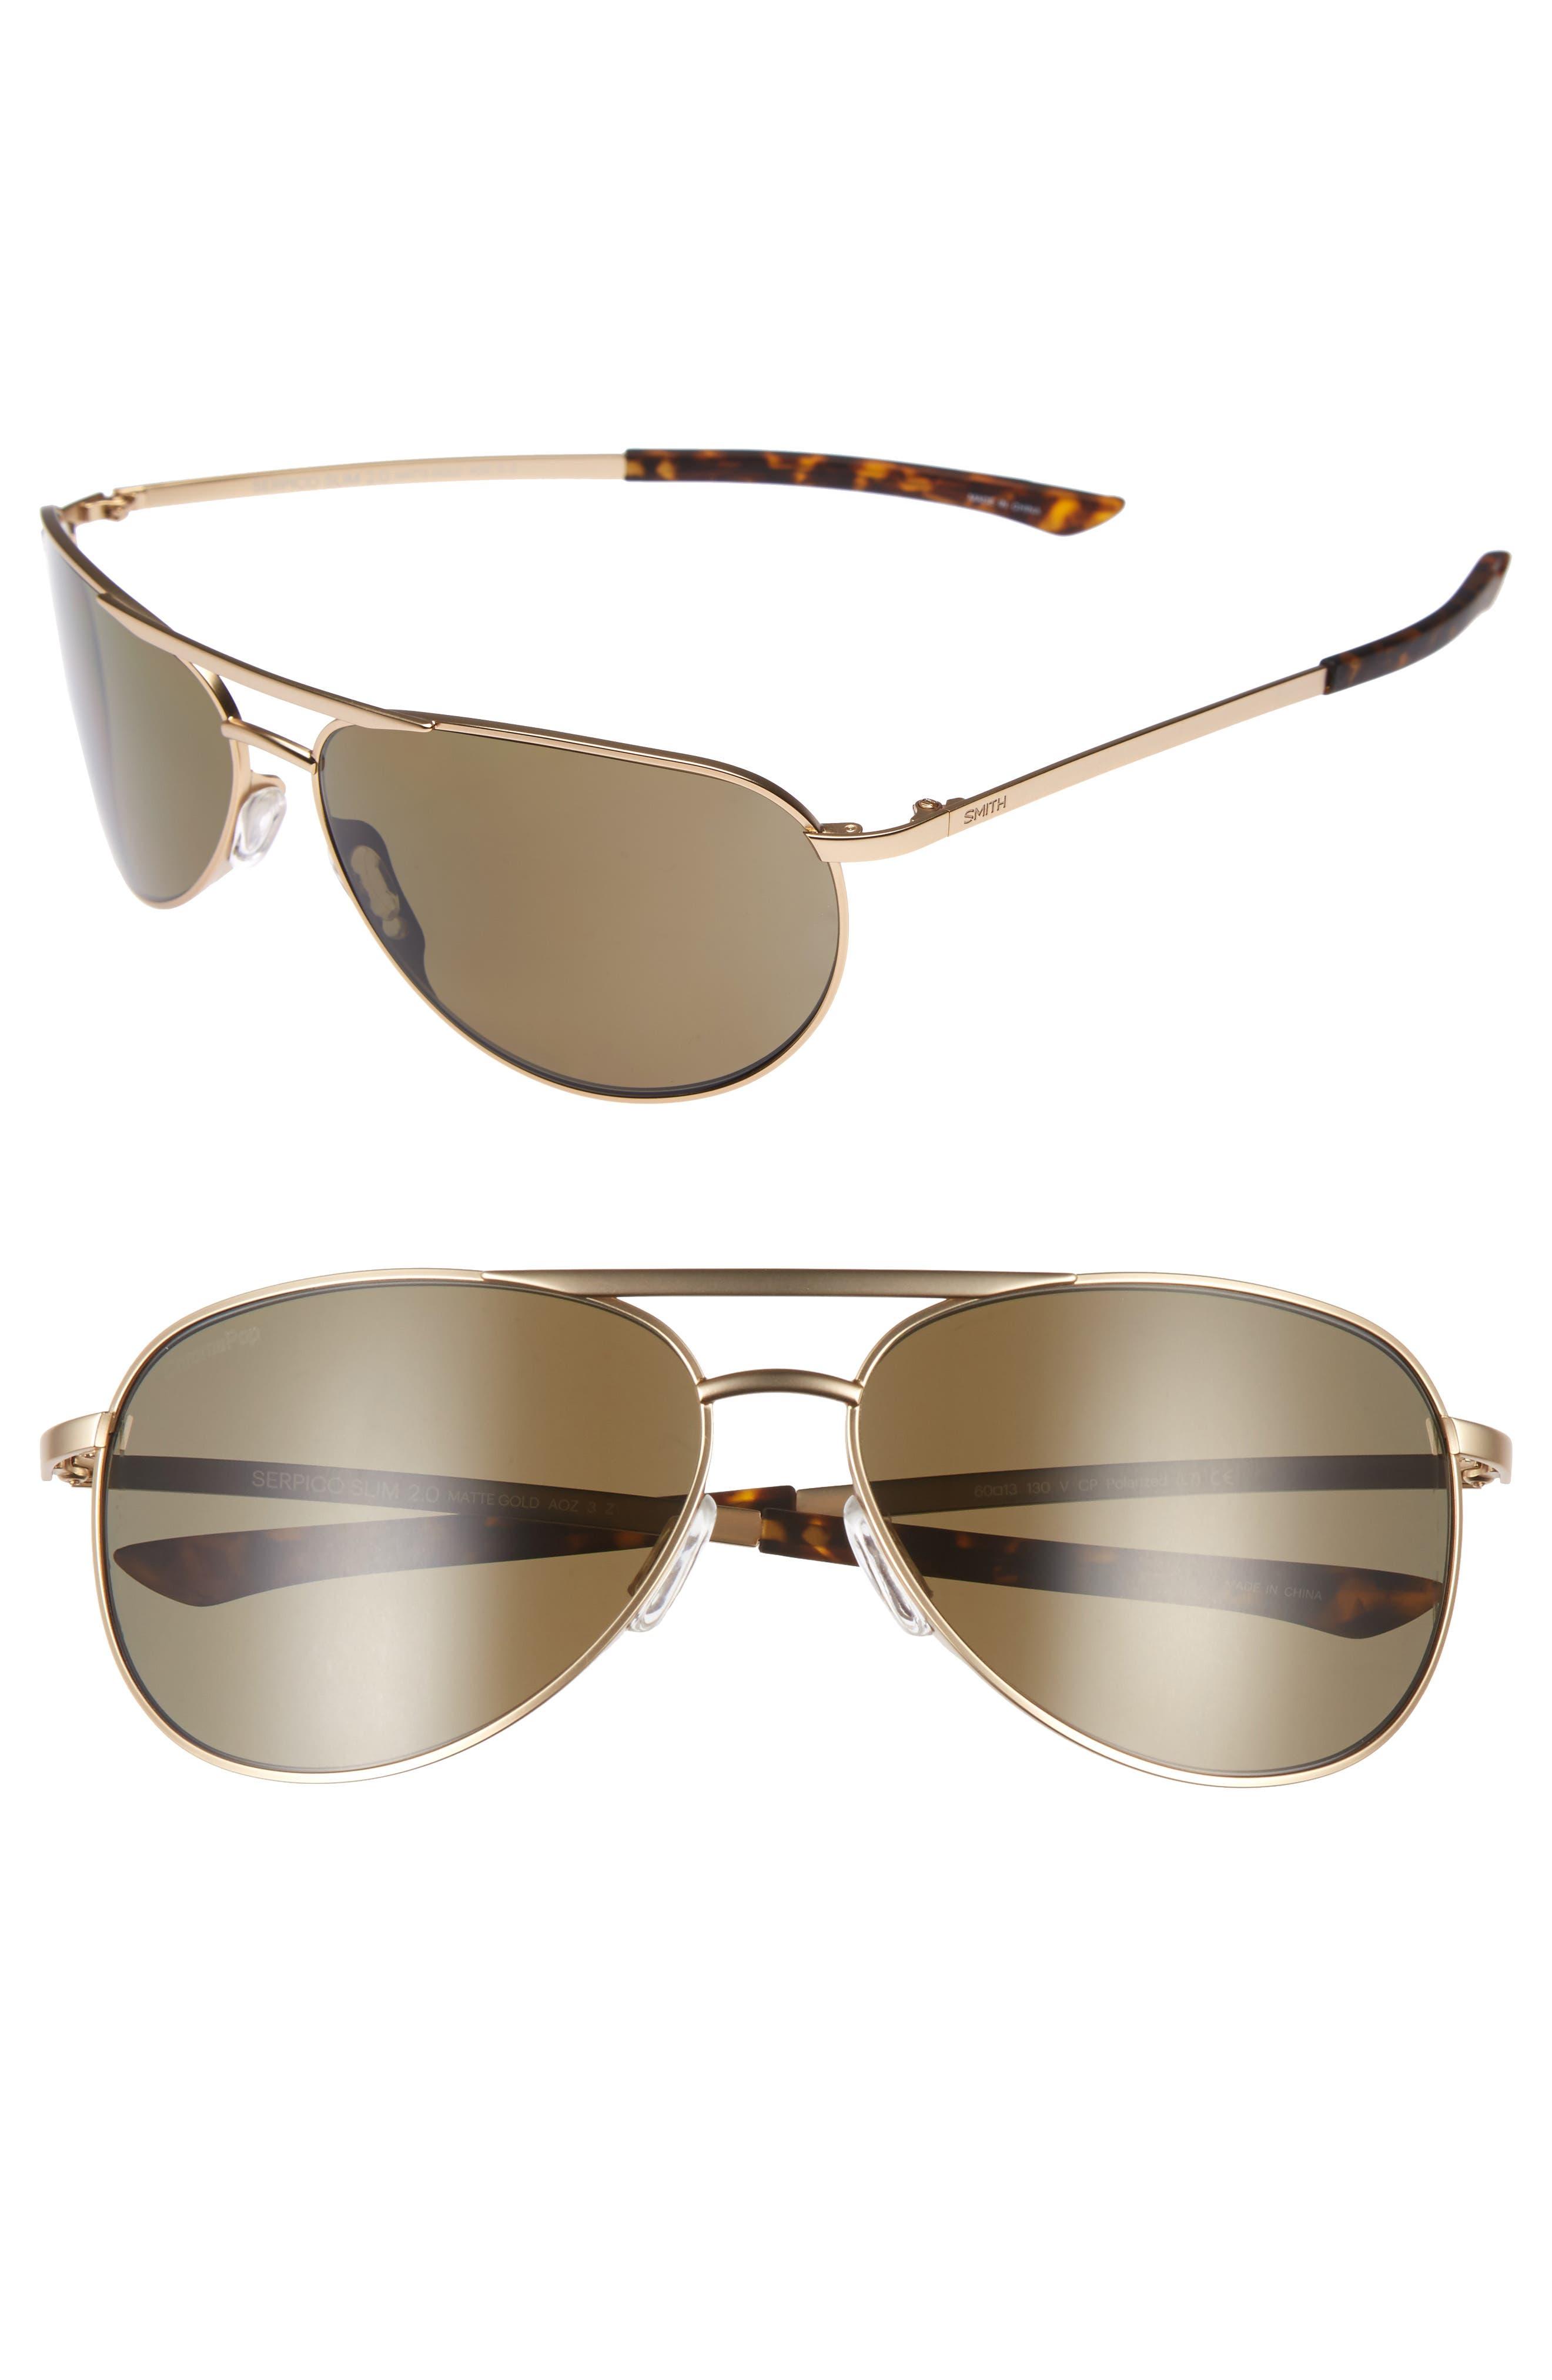 Serpico Slim 2.0 60mm ChromaPop Polarized Aviator Sunglasses,                             Main thumbnail 1, color,                             Gold/ Brown Polar